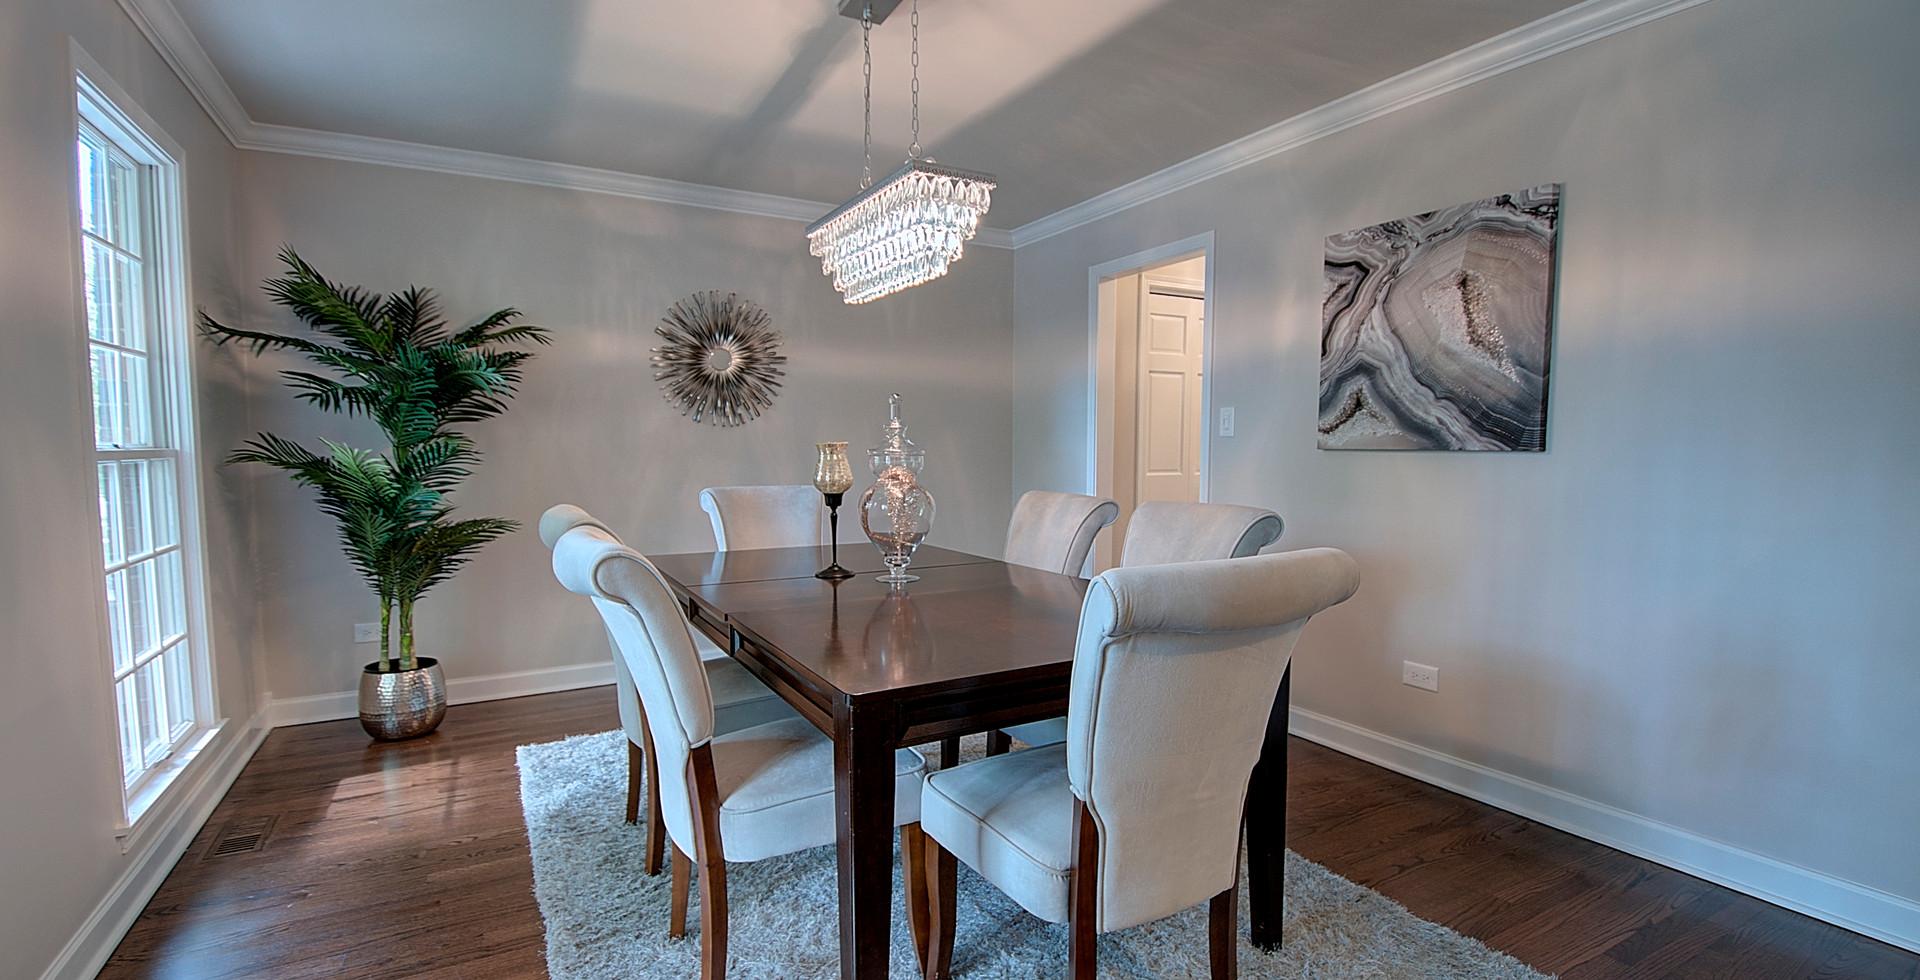 Dining Room in Clarendon Hills designed by MRM Home Design.jpg